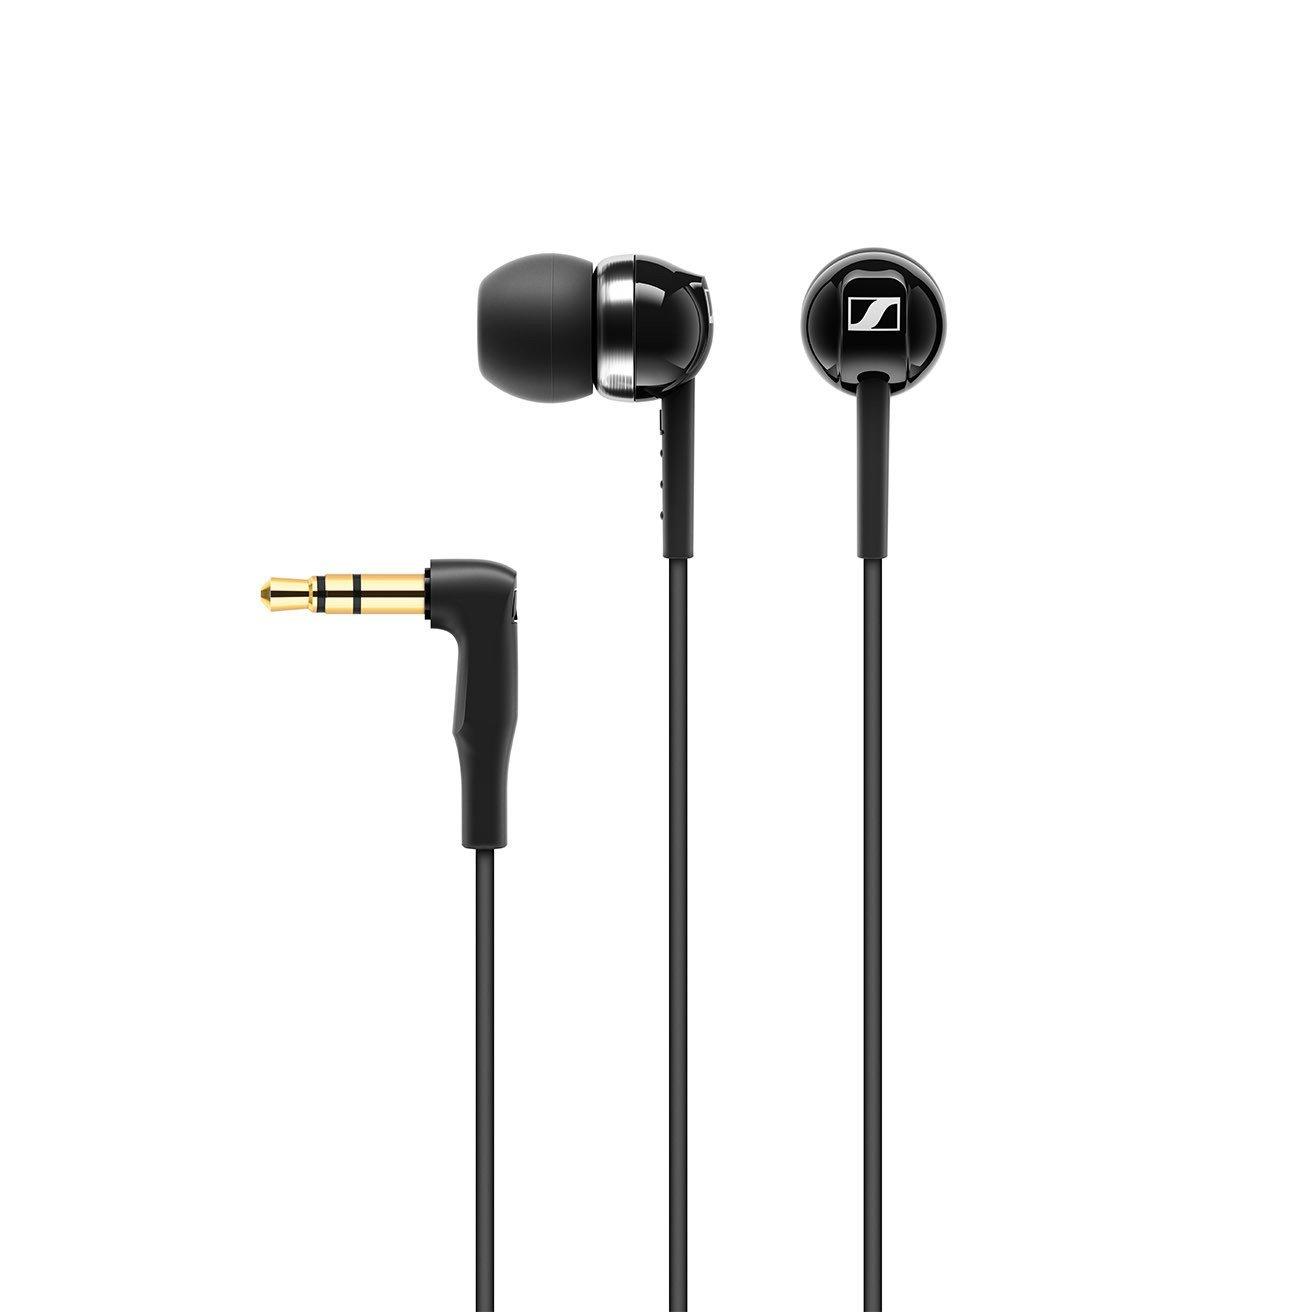 Sennheiser CX 100 Wired In-Ear Heaphones - Black image